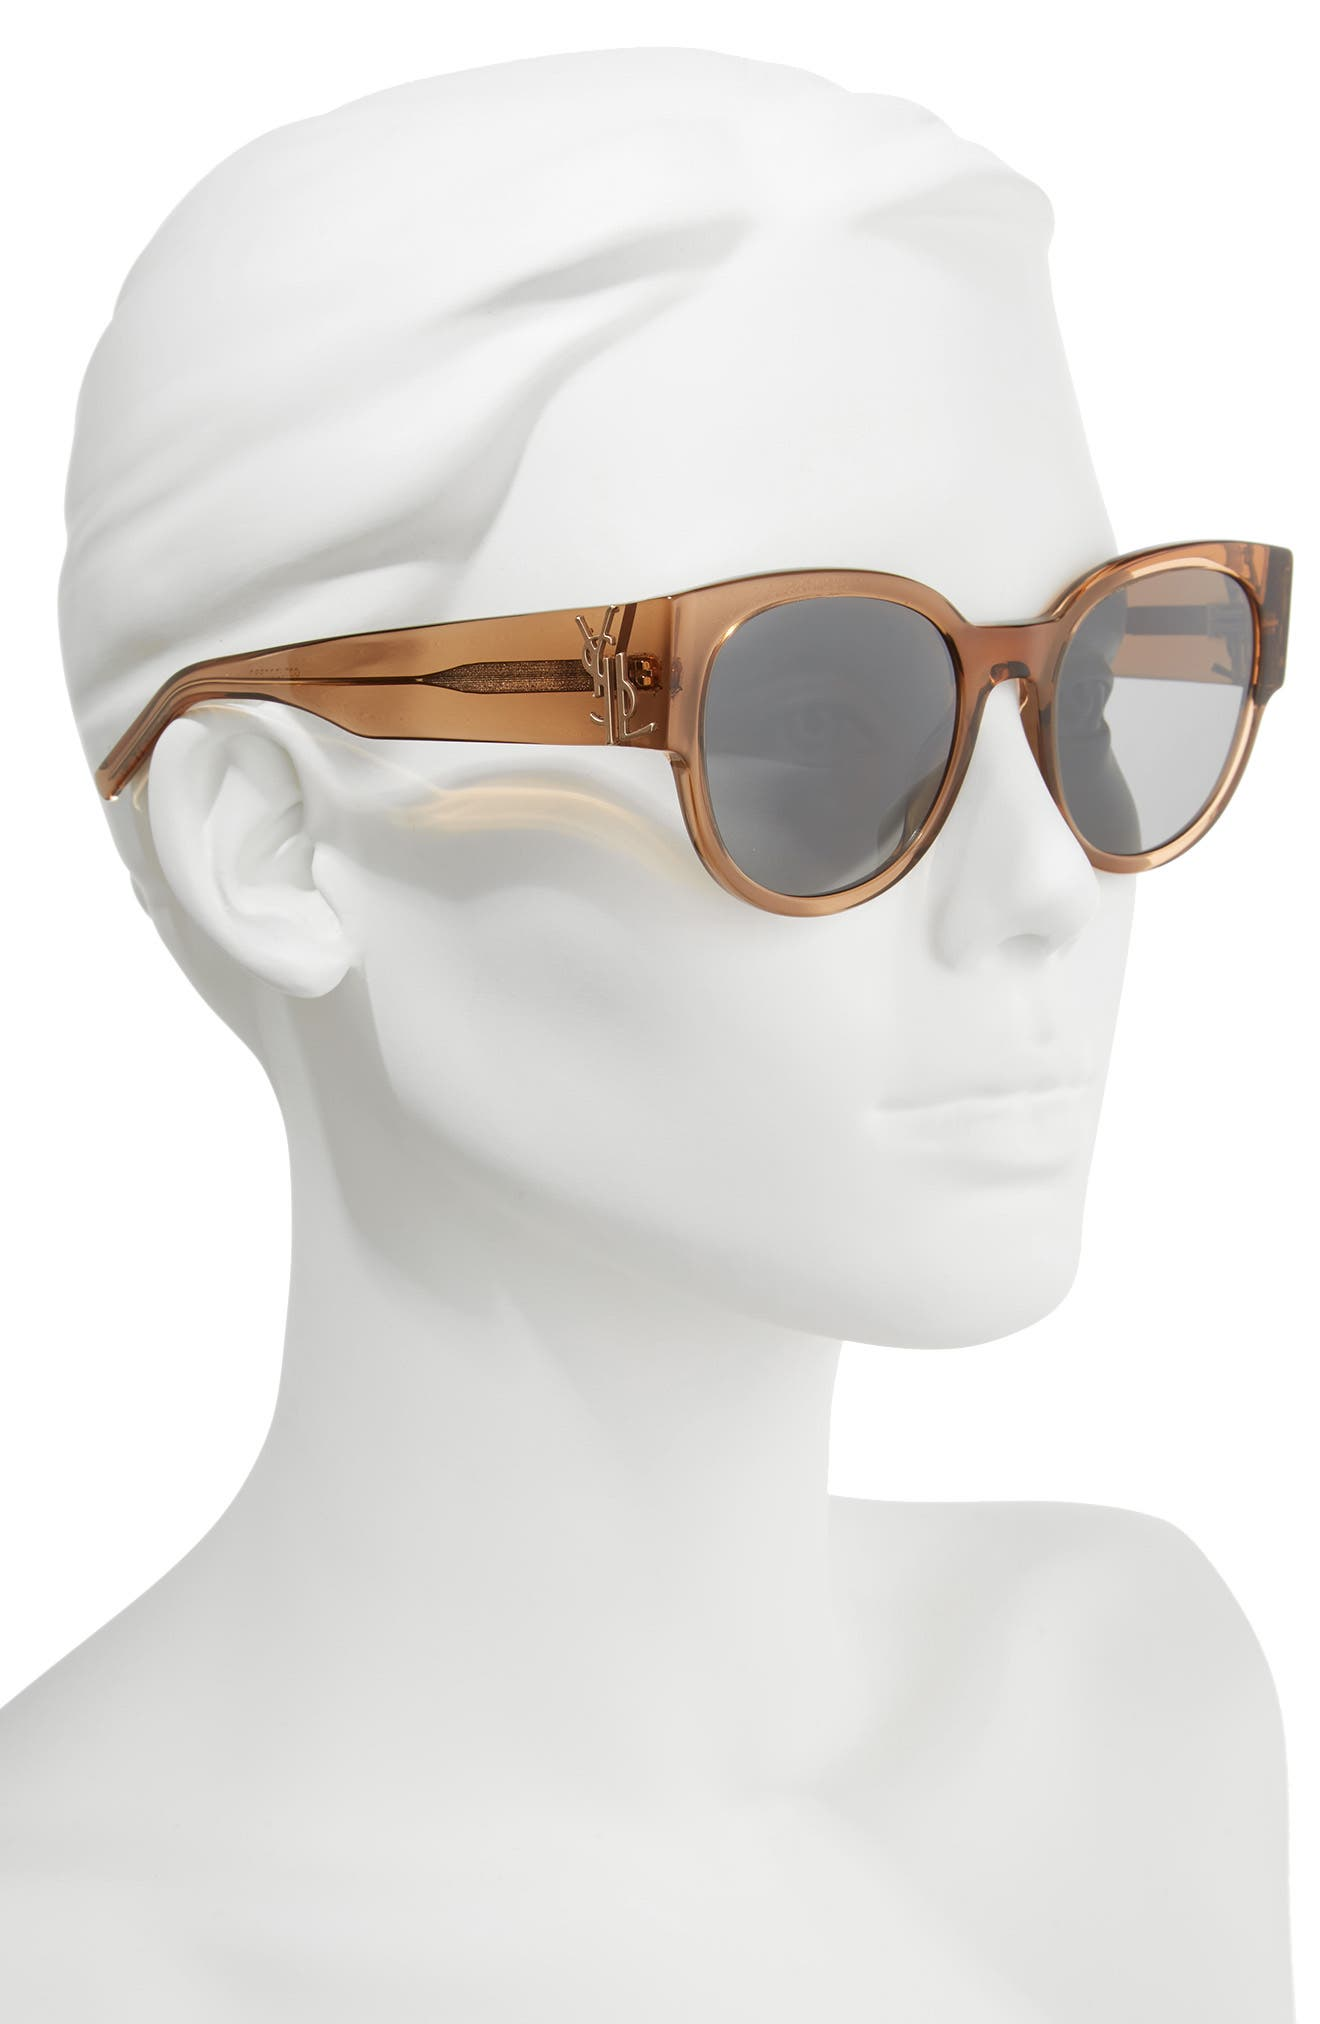 SL M19 54mm Cat Eye Sunglasses,                             Alternate thumbnail 2, color,                             NUDE